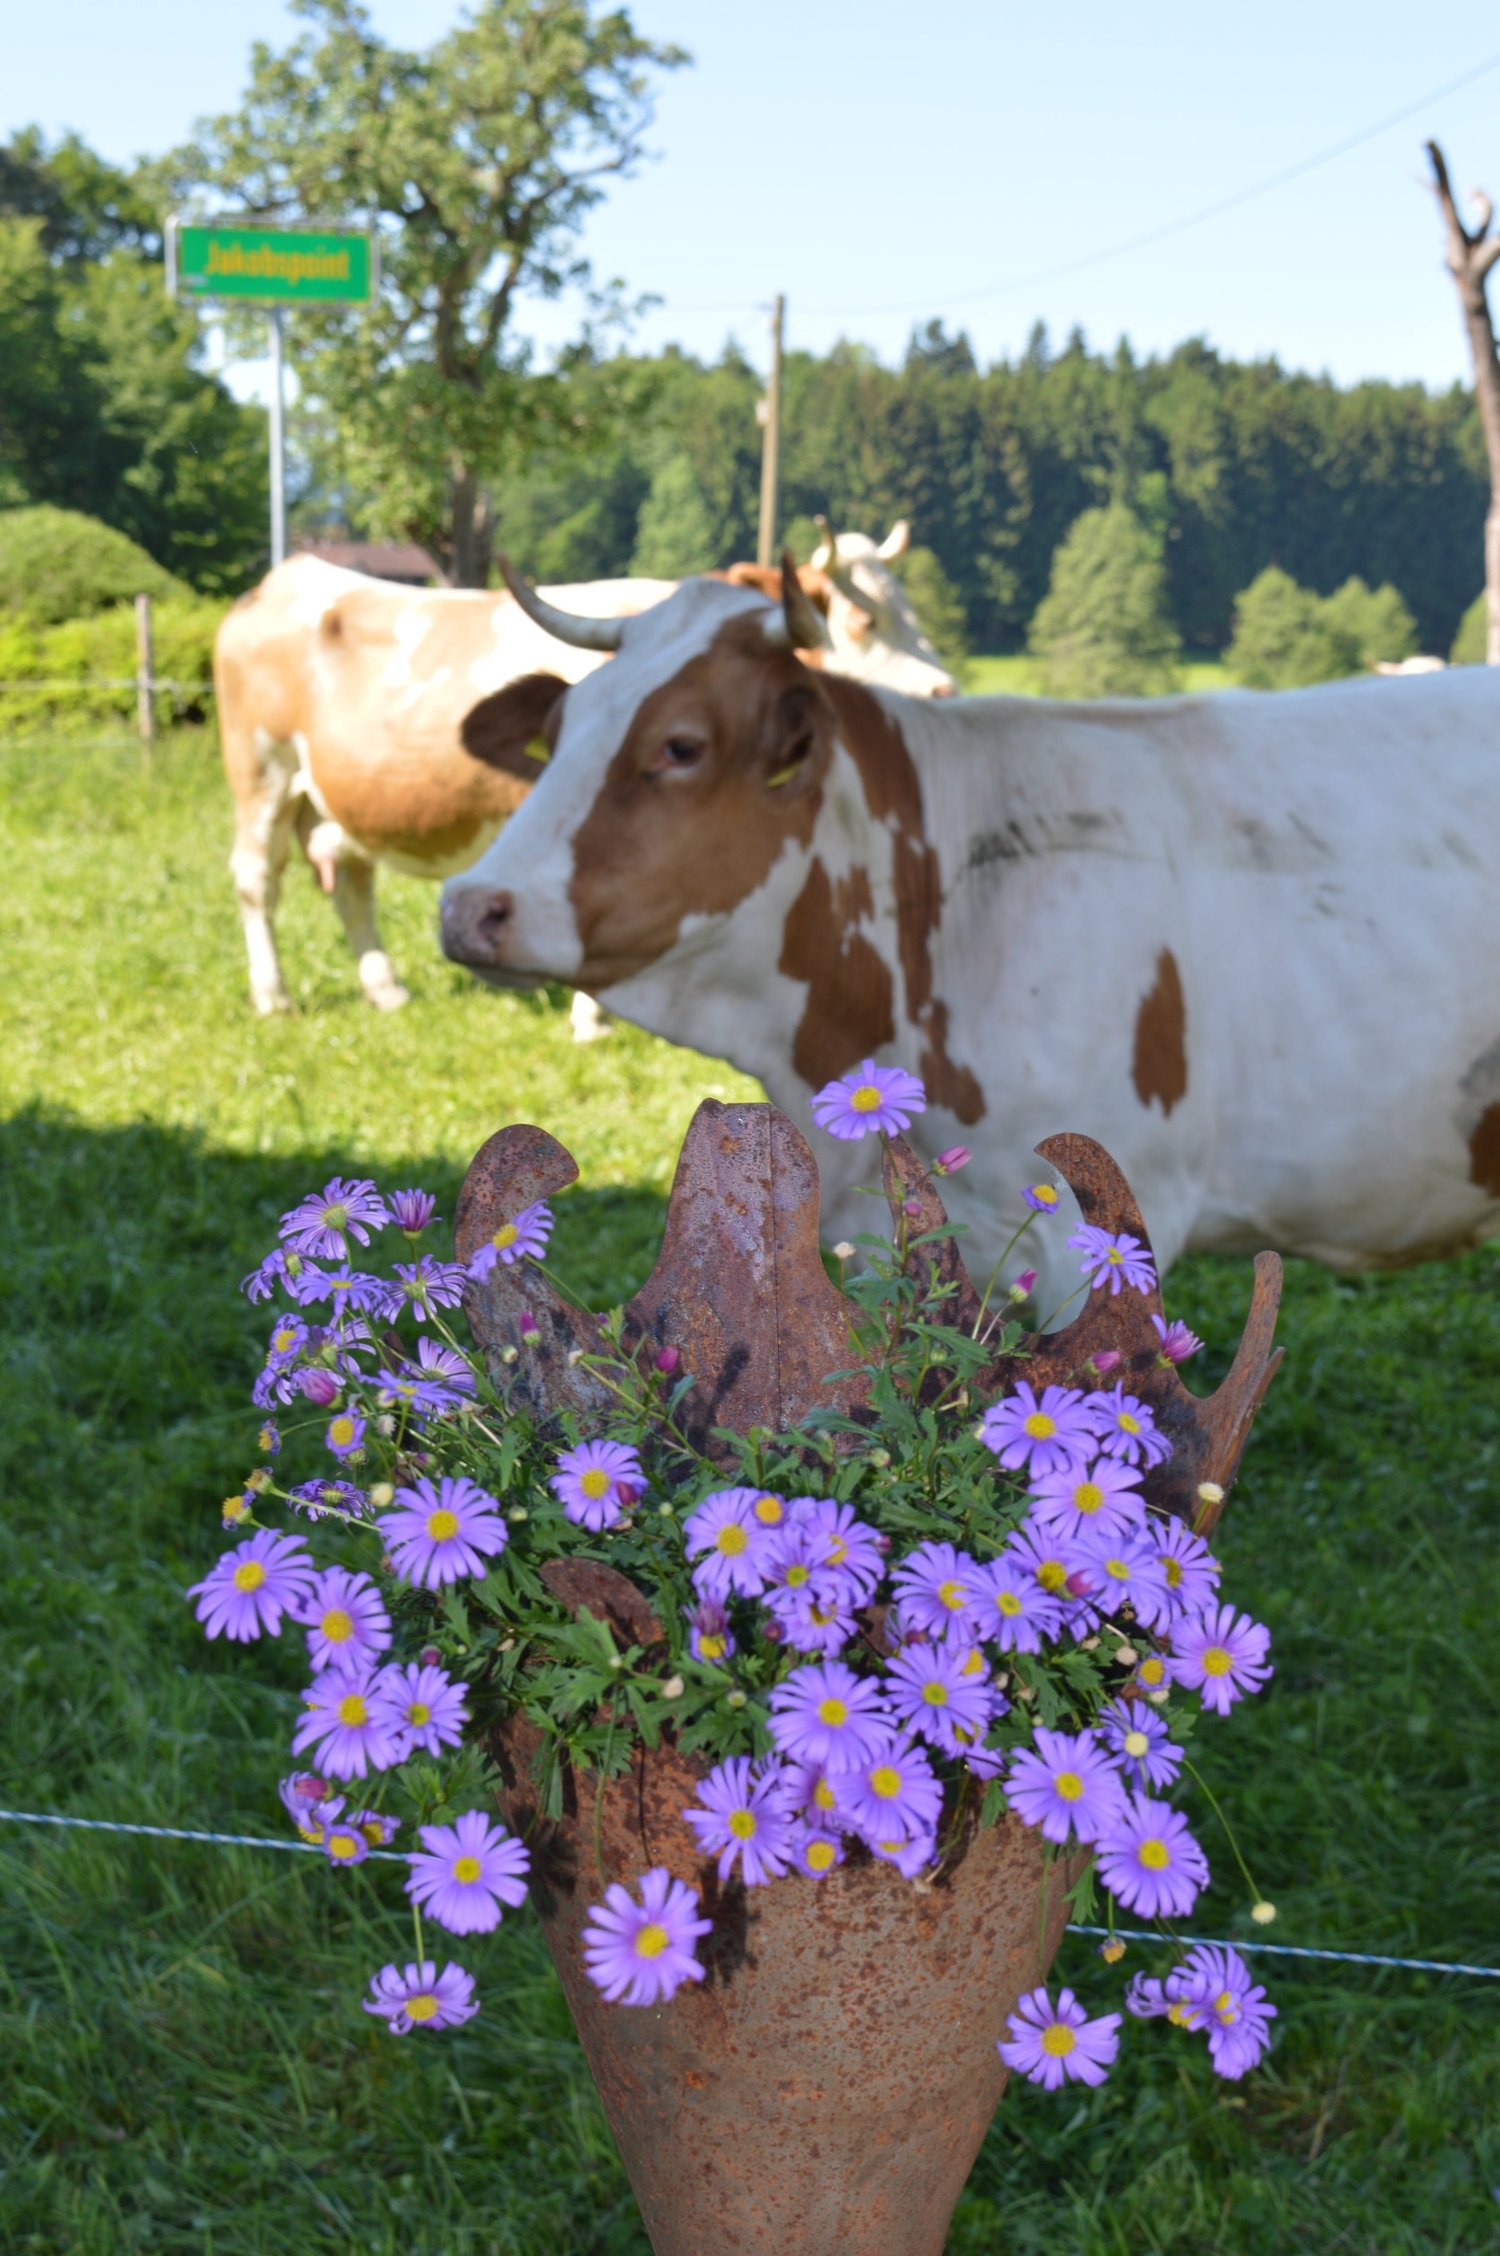 Kuh+&+Blumen.jpg